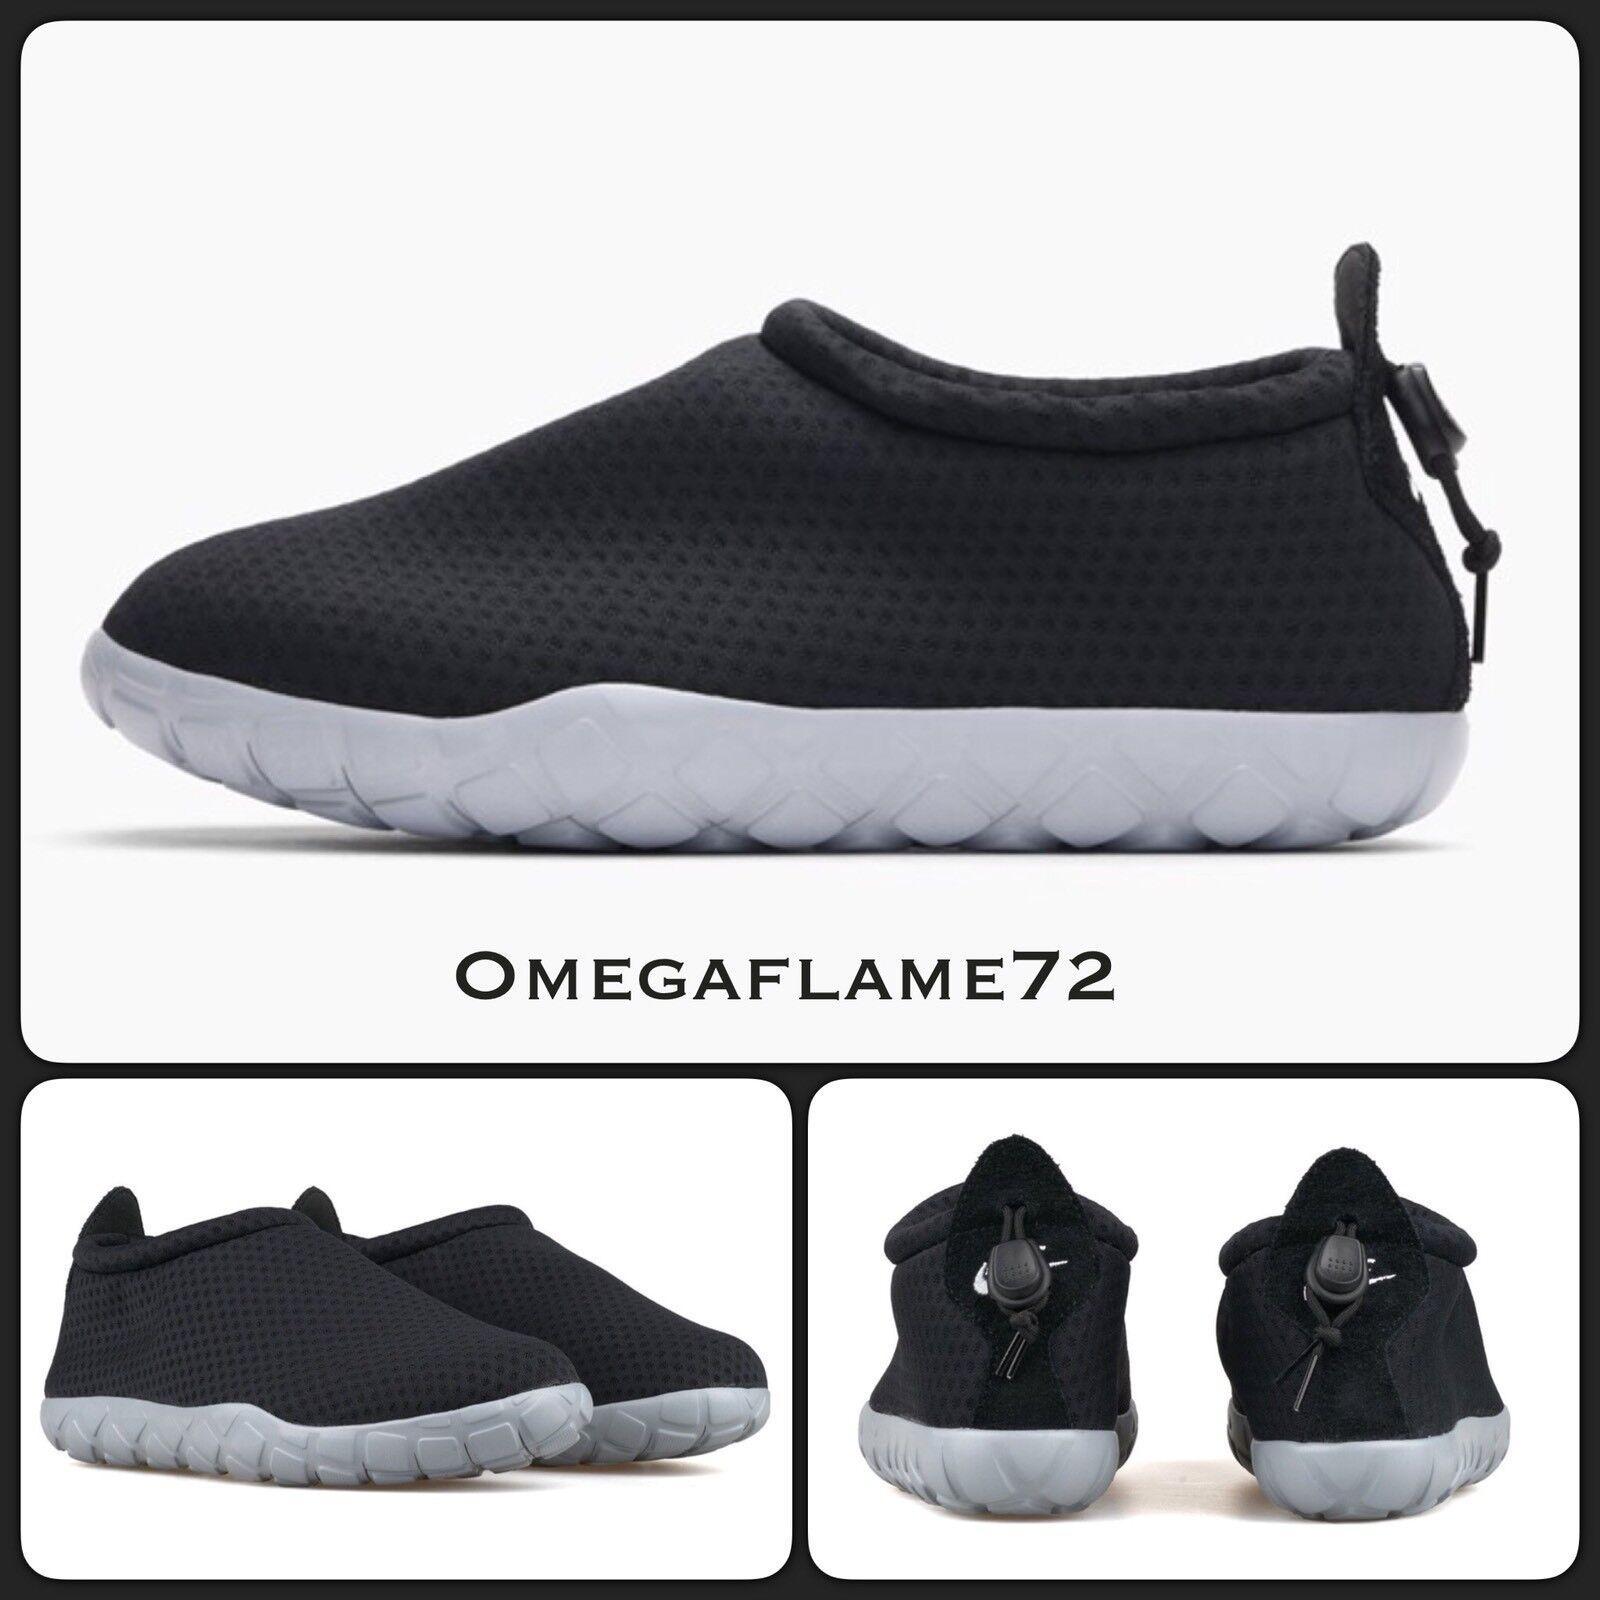 Nike Air Moc Ultra BR, Nero, 902777-001, UE 48.5, 48.5, 48.5, US 14 | I Clienti Prima  | Bella arte  | Queensland  | Maschio/Ragazze Scarpa  | Scolaro/Ragazze Scarpa  | Uomini/Donne Scarpa  534a55